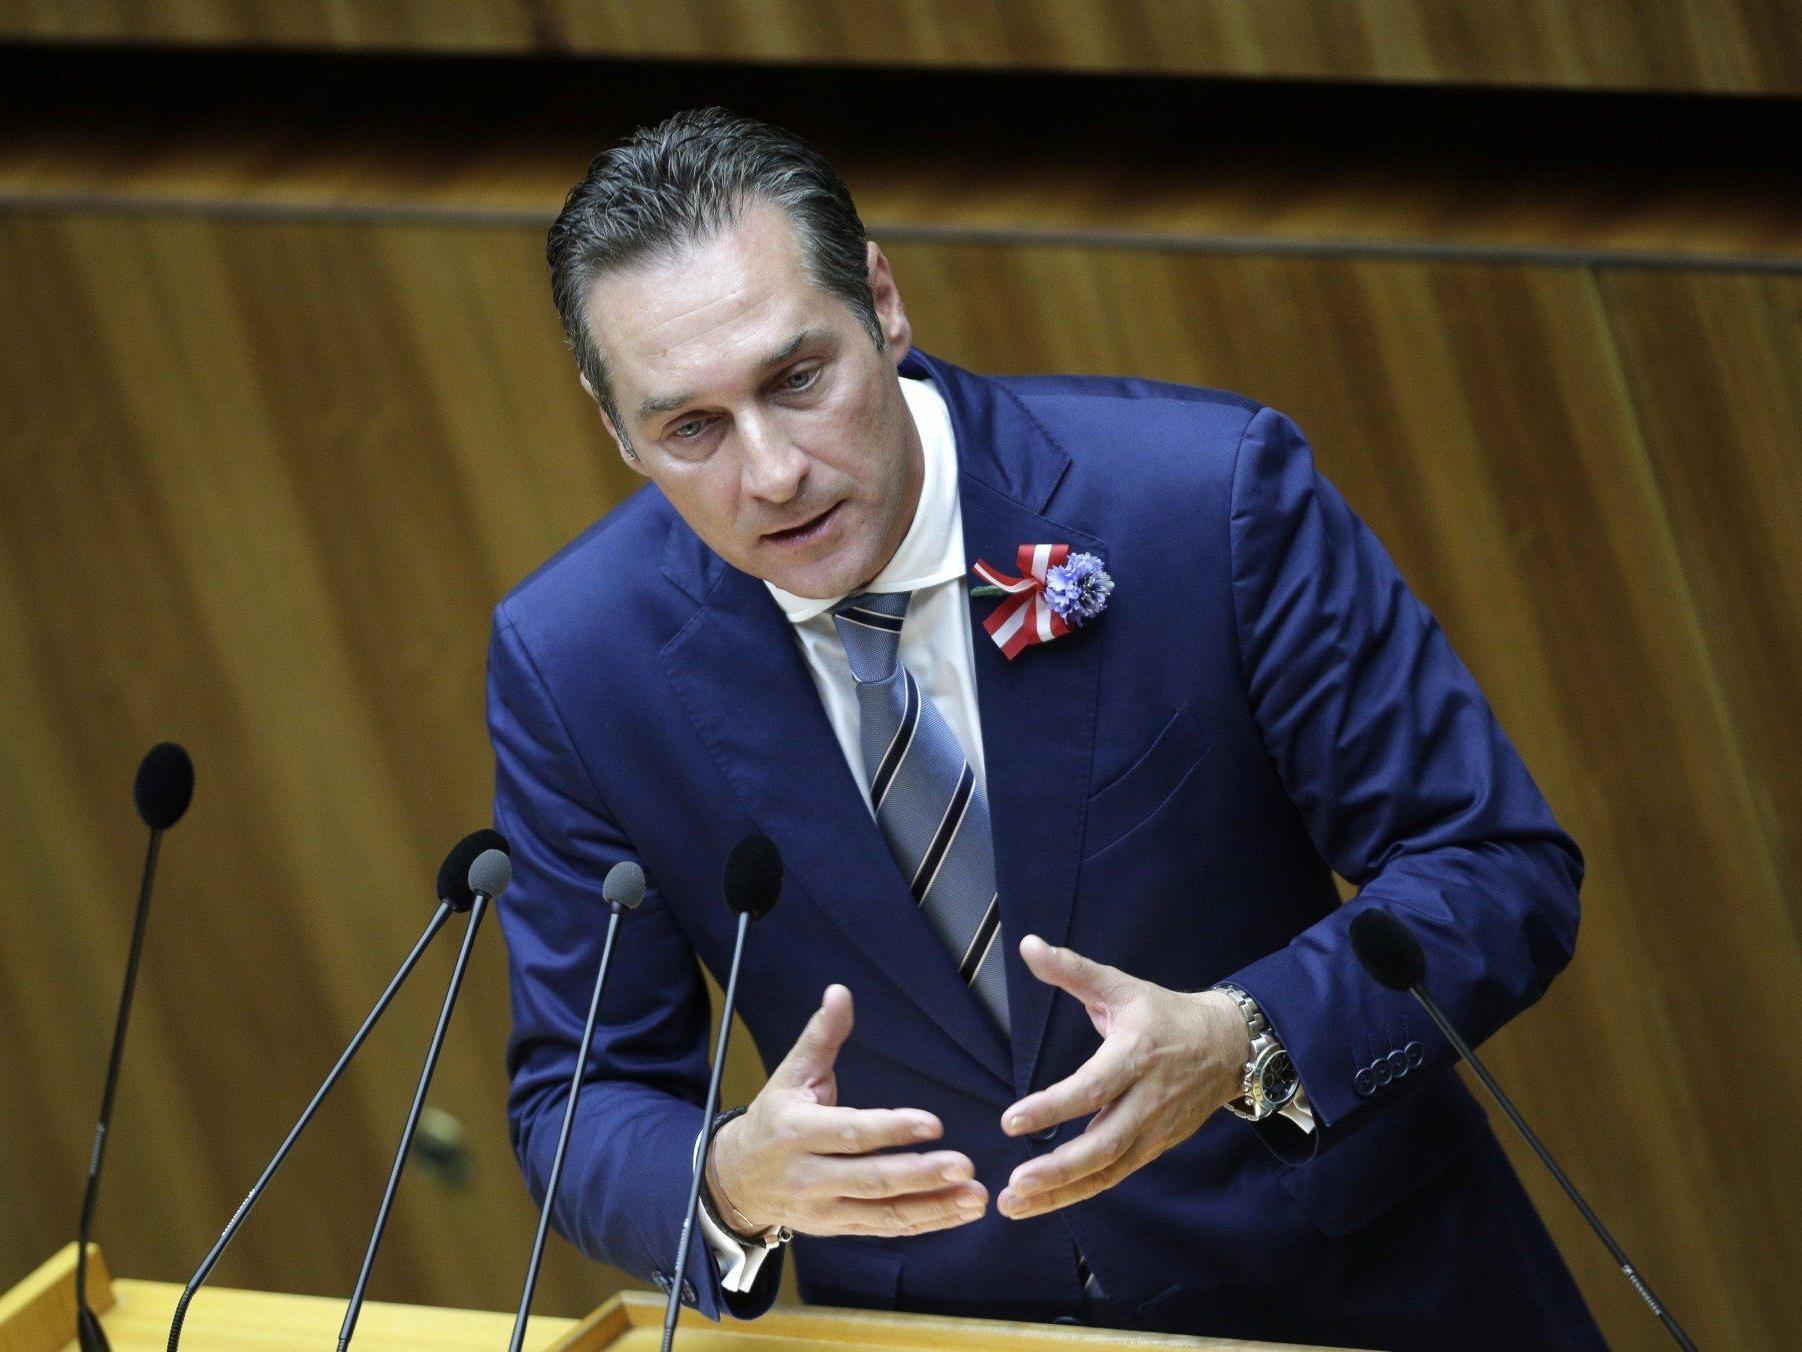 FPÖ-Ziel bei der EU-Wahl 2014: 20 Prozent.